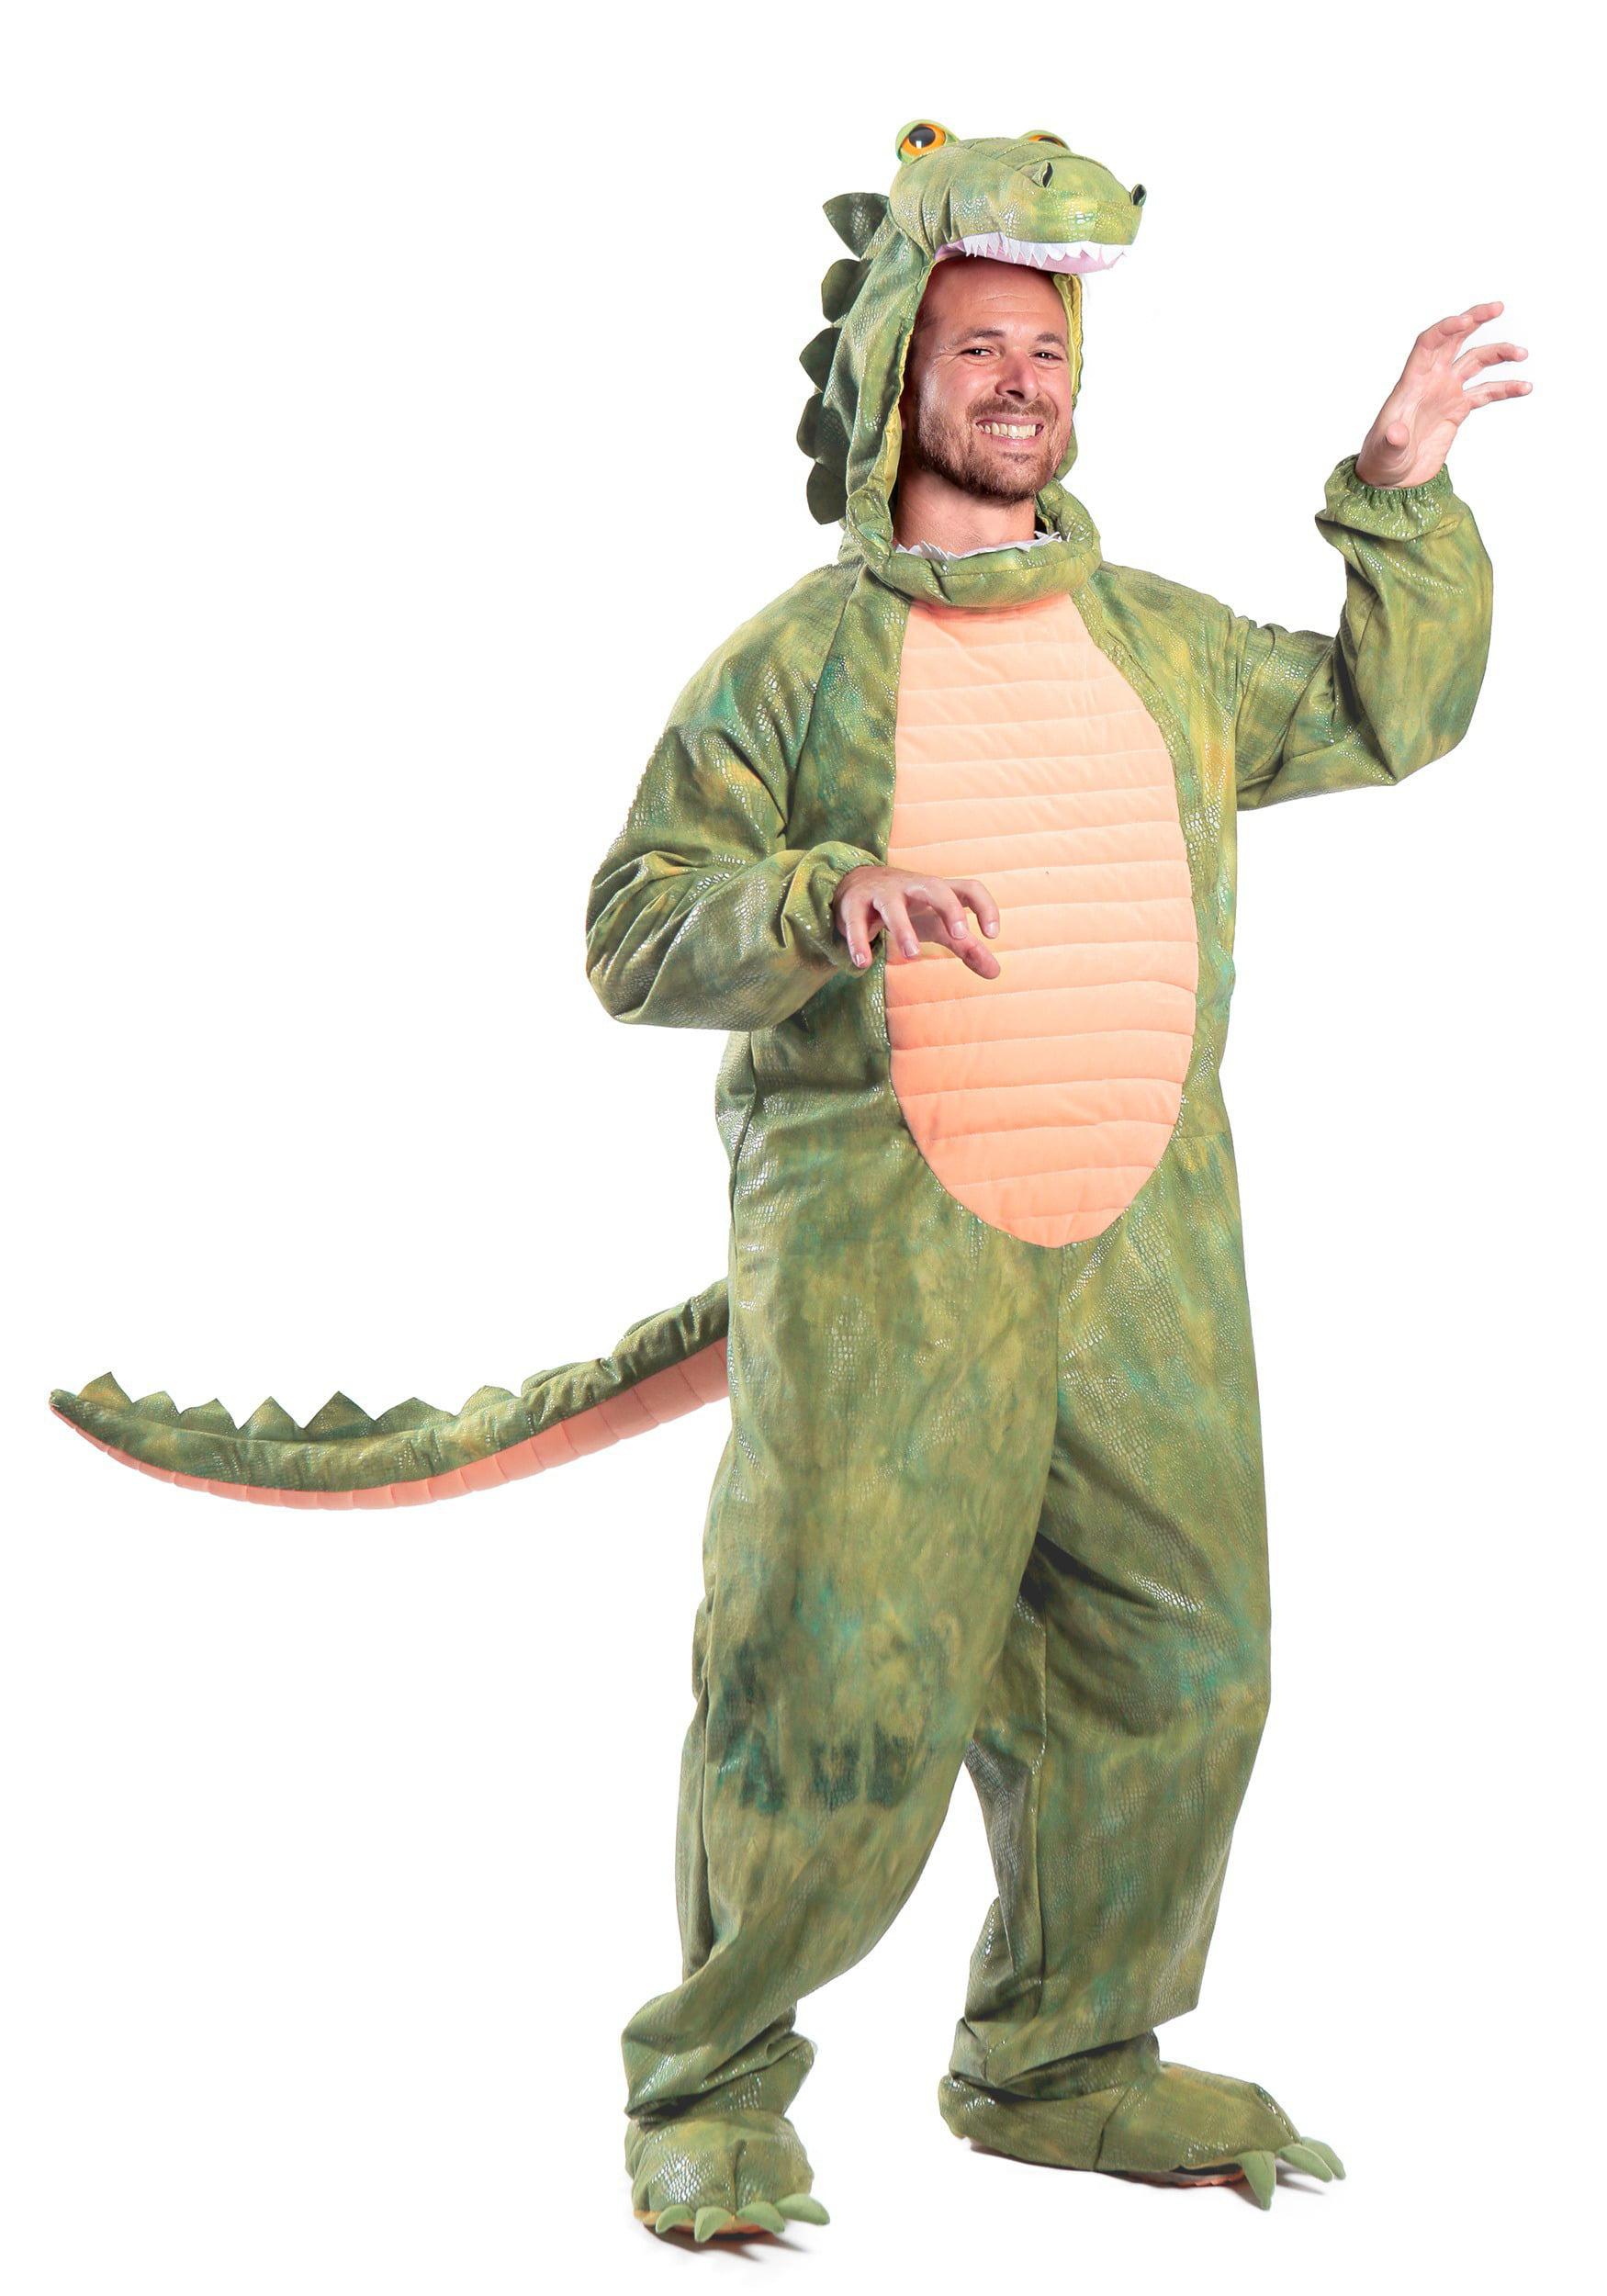 sc 1 st  Walmart & Plus Size Alligator Costume - Walmart.com